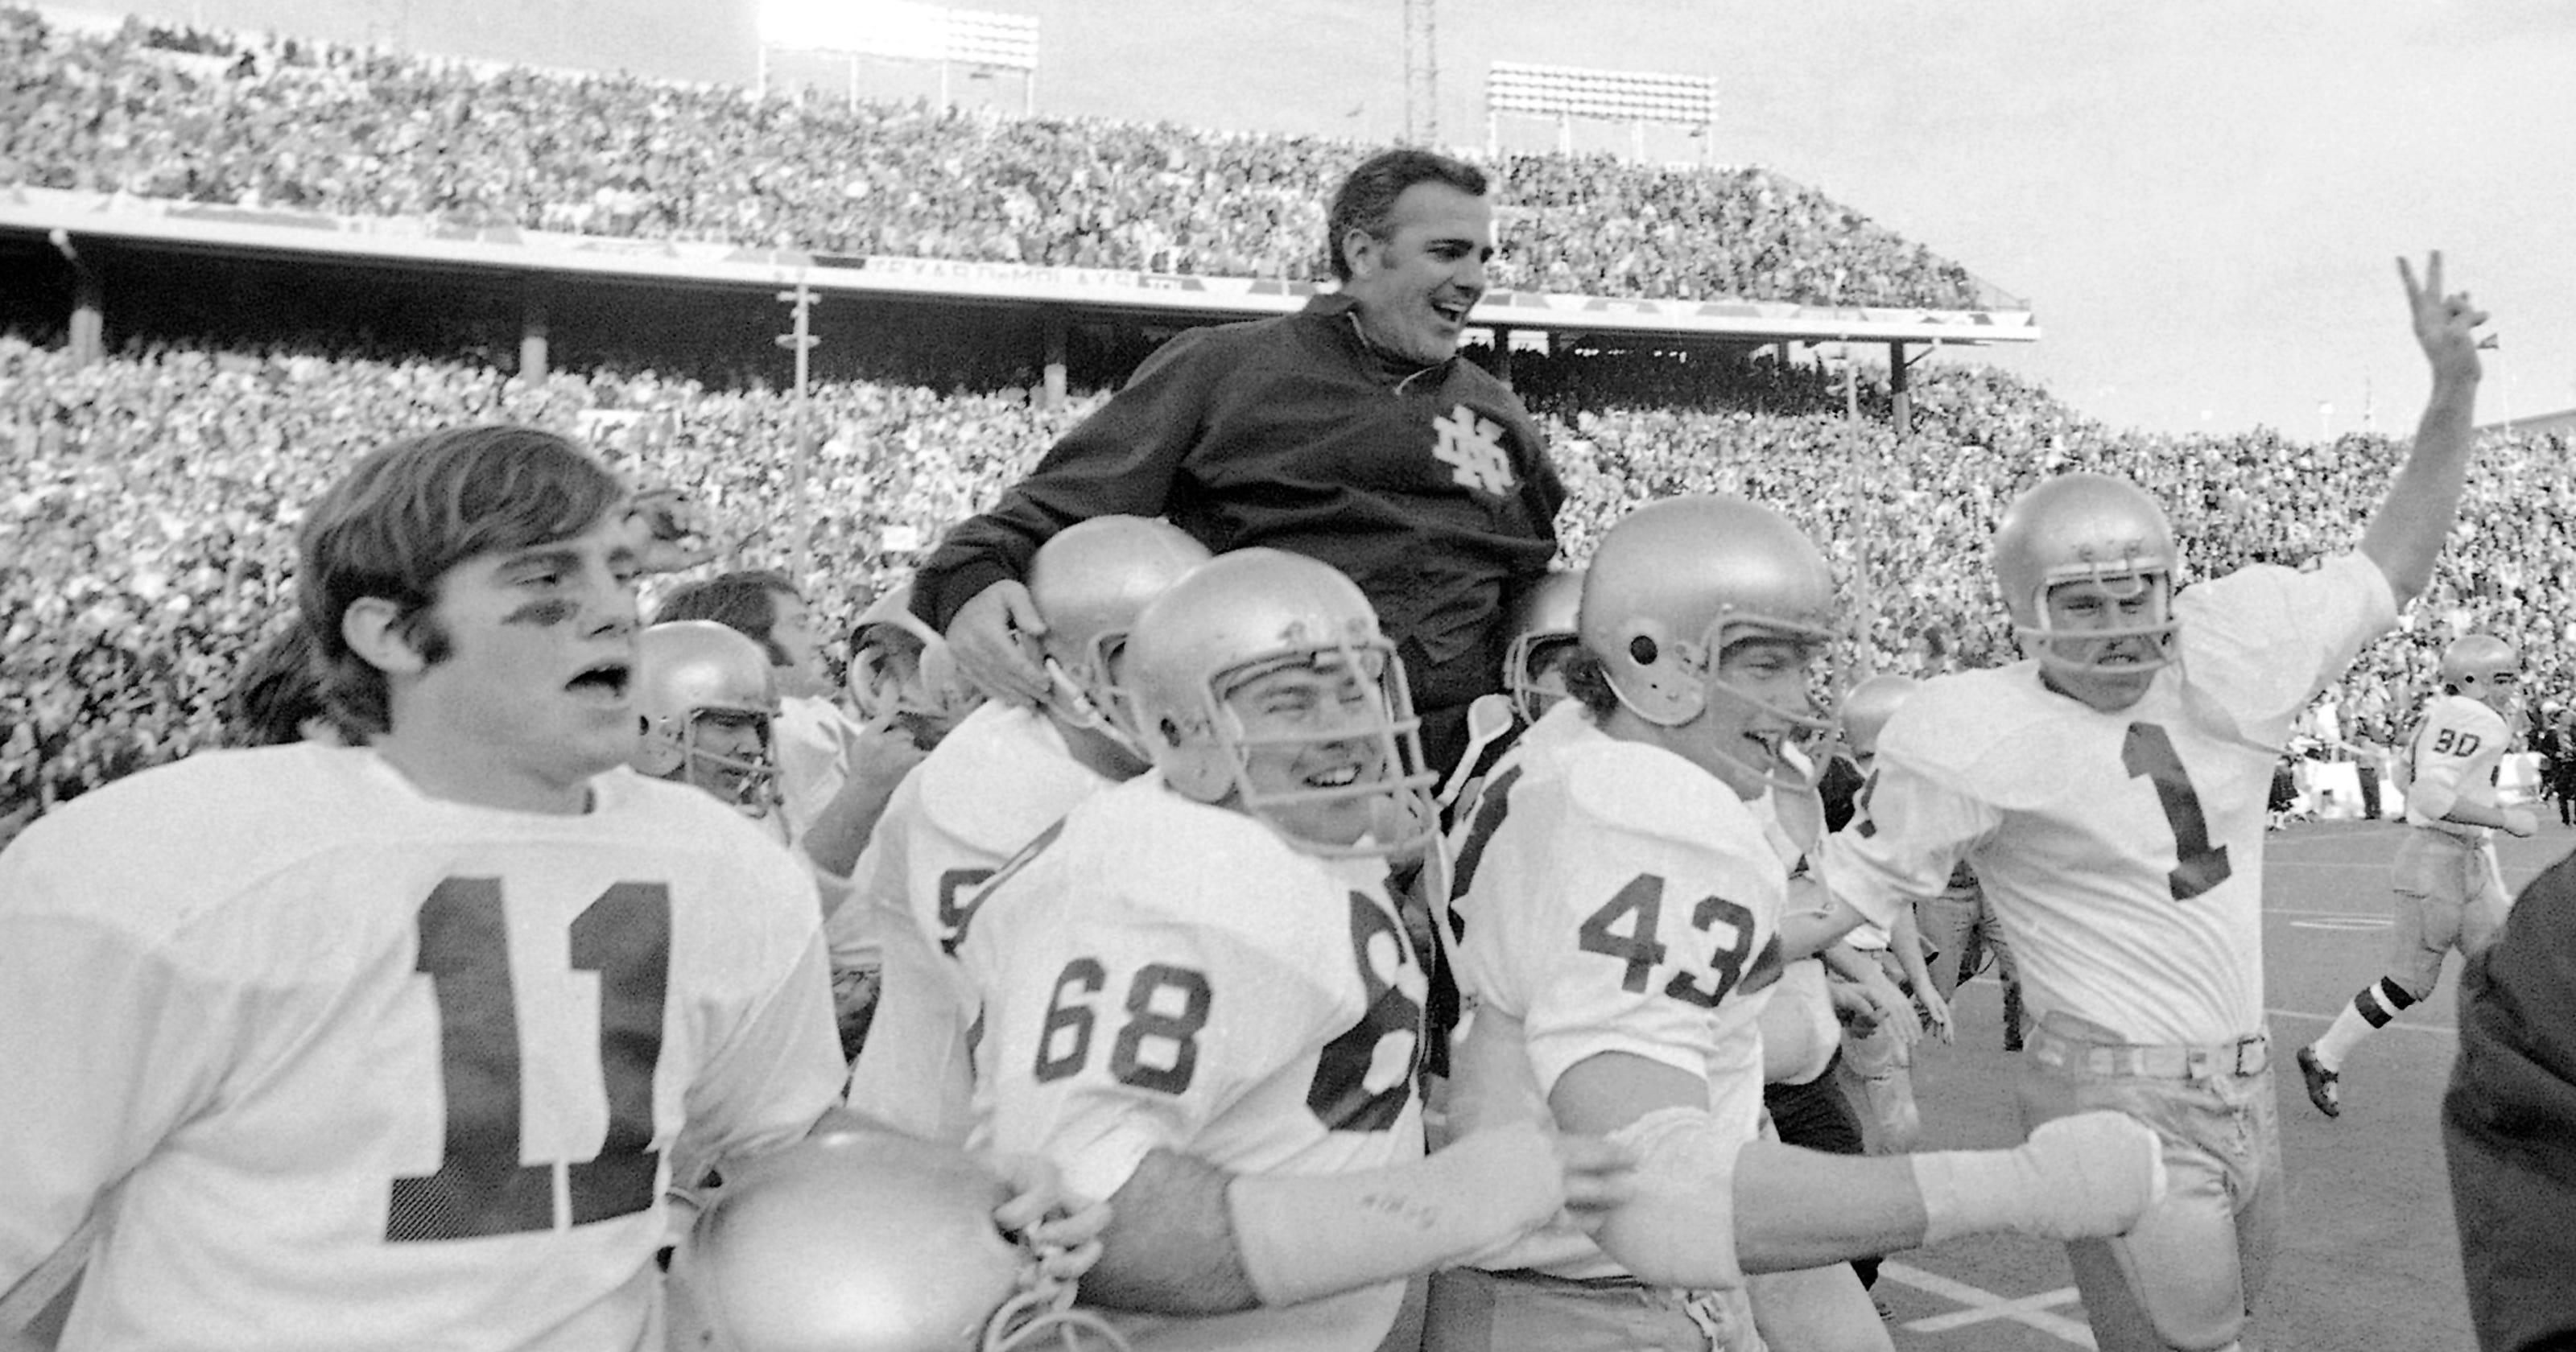 7fdd050b16f Legendary Notre Dame coach Ara Parseghian dies at 94